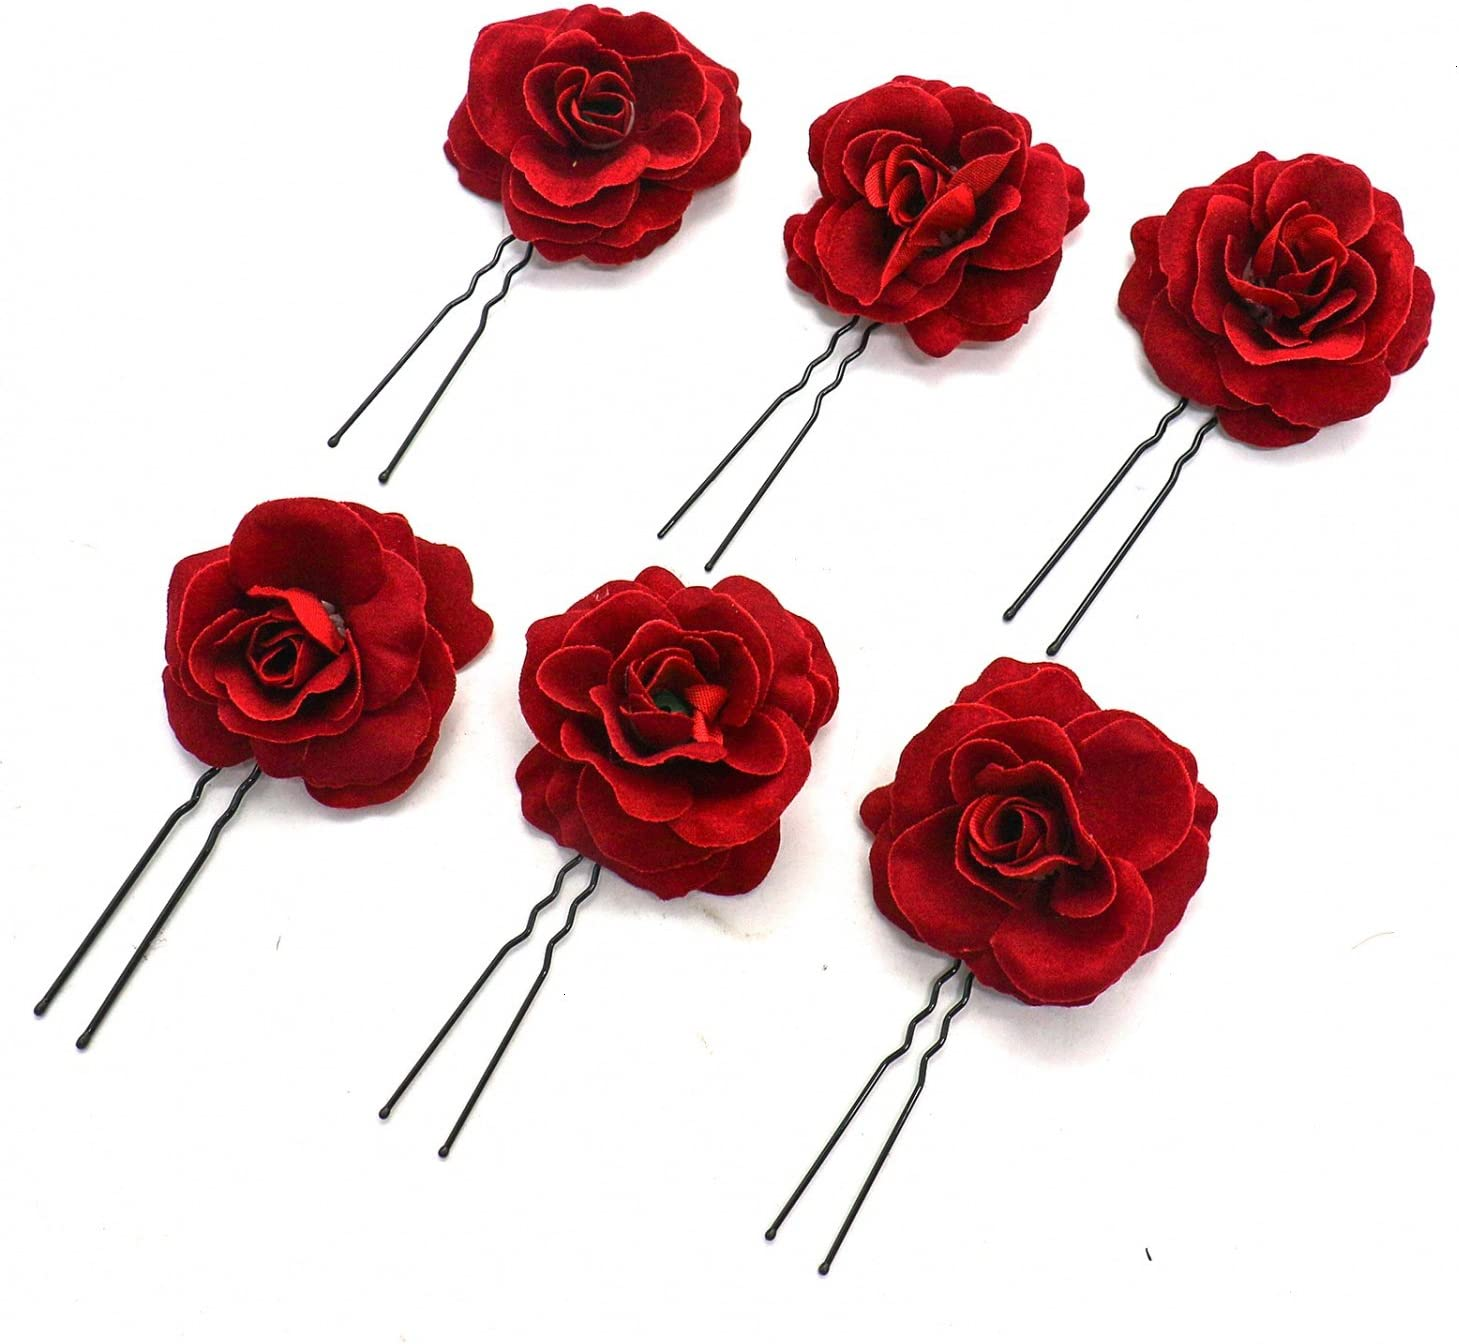 Gonioa 6 Pack Buorsa Elegant Red Rose Bridal Hair Clips Wedding Women and Girls Hair Accessories Bridesmaids Headpiece